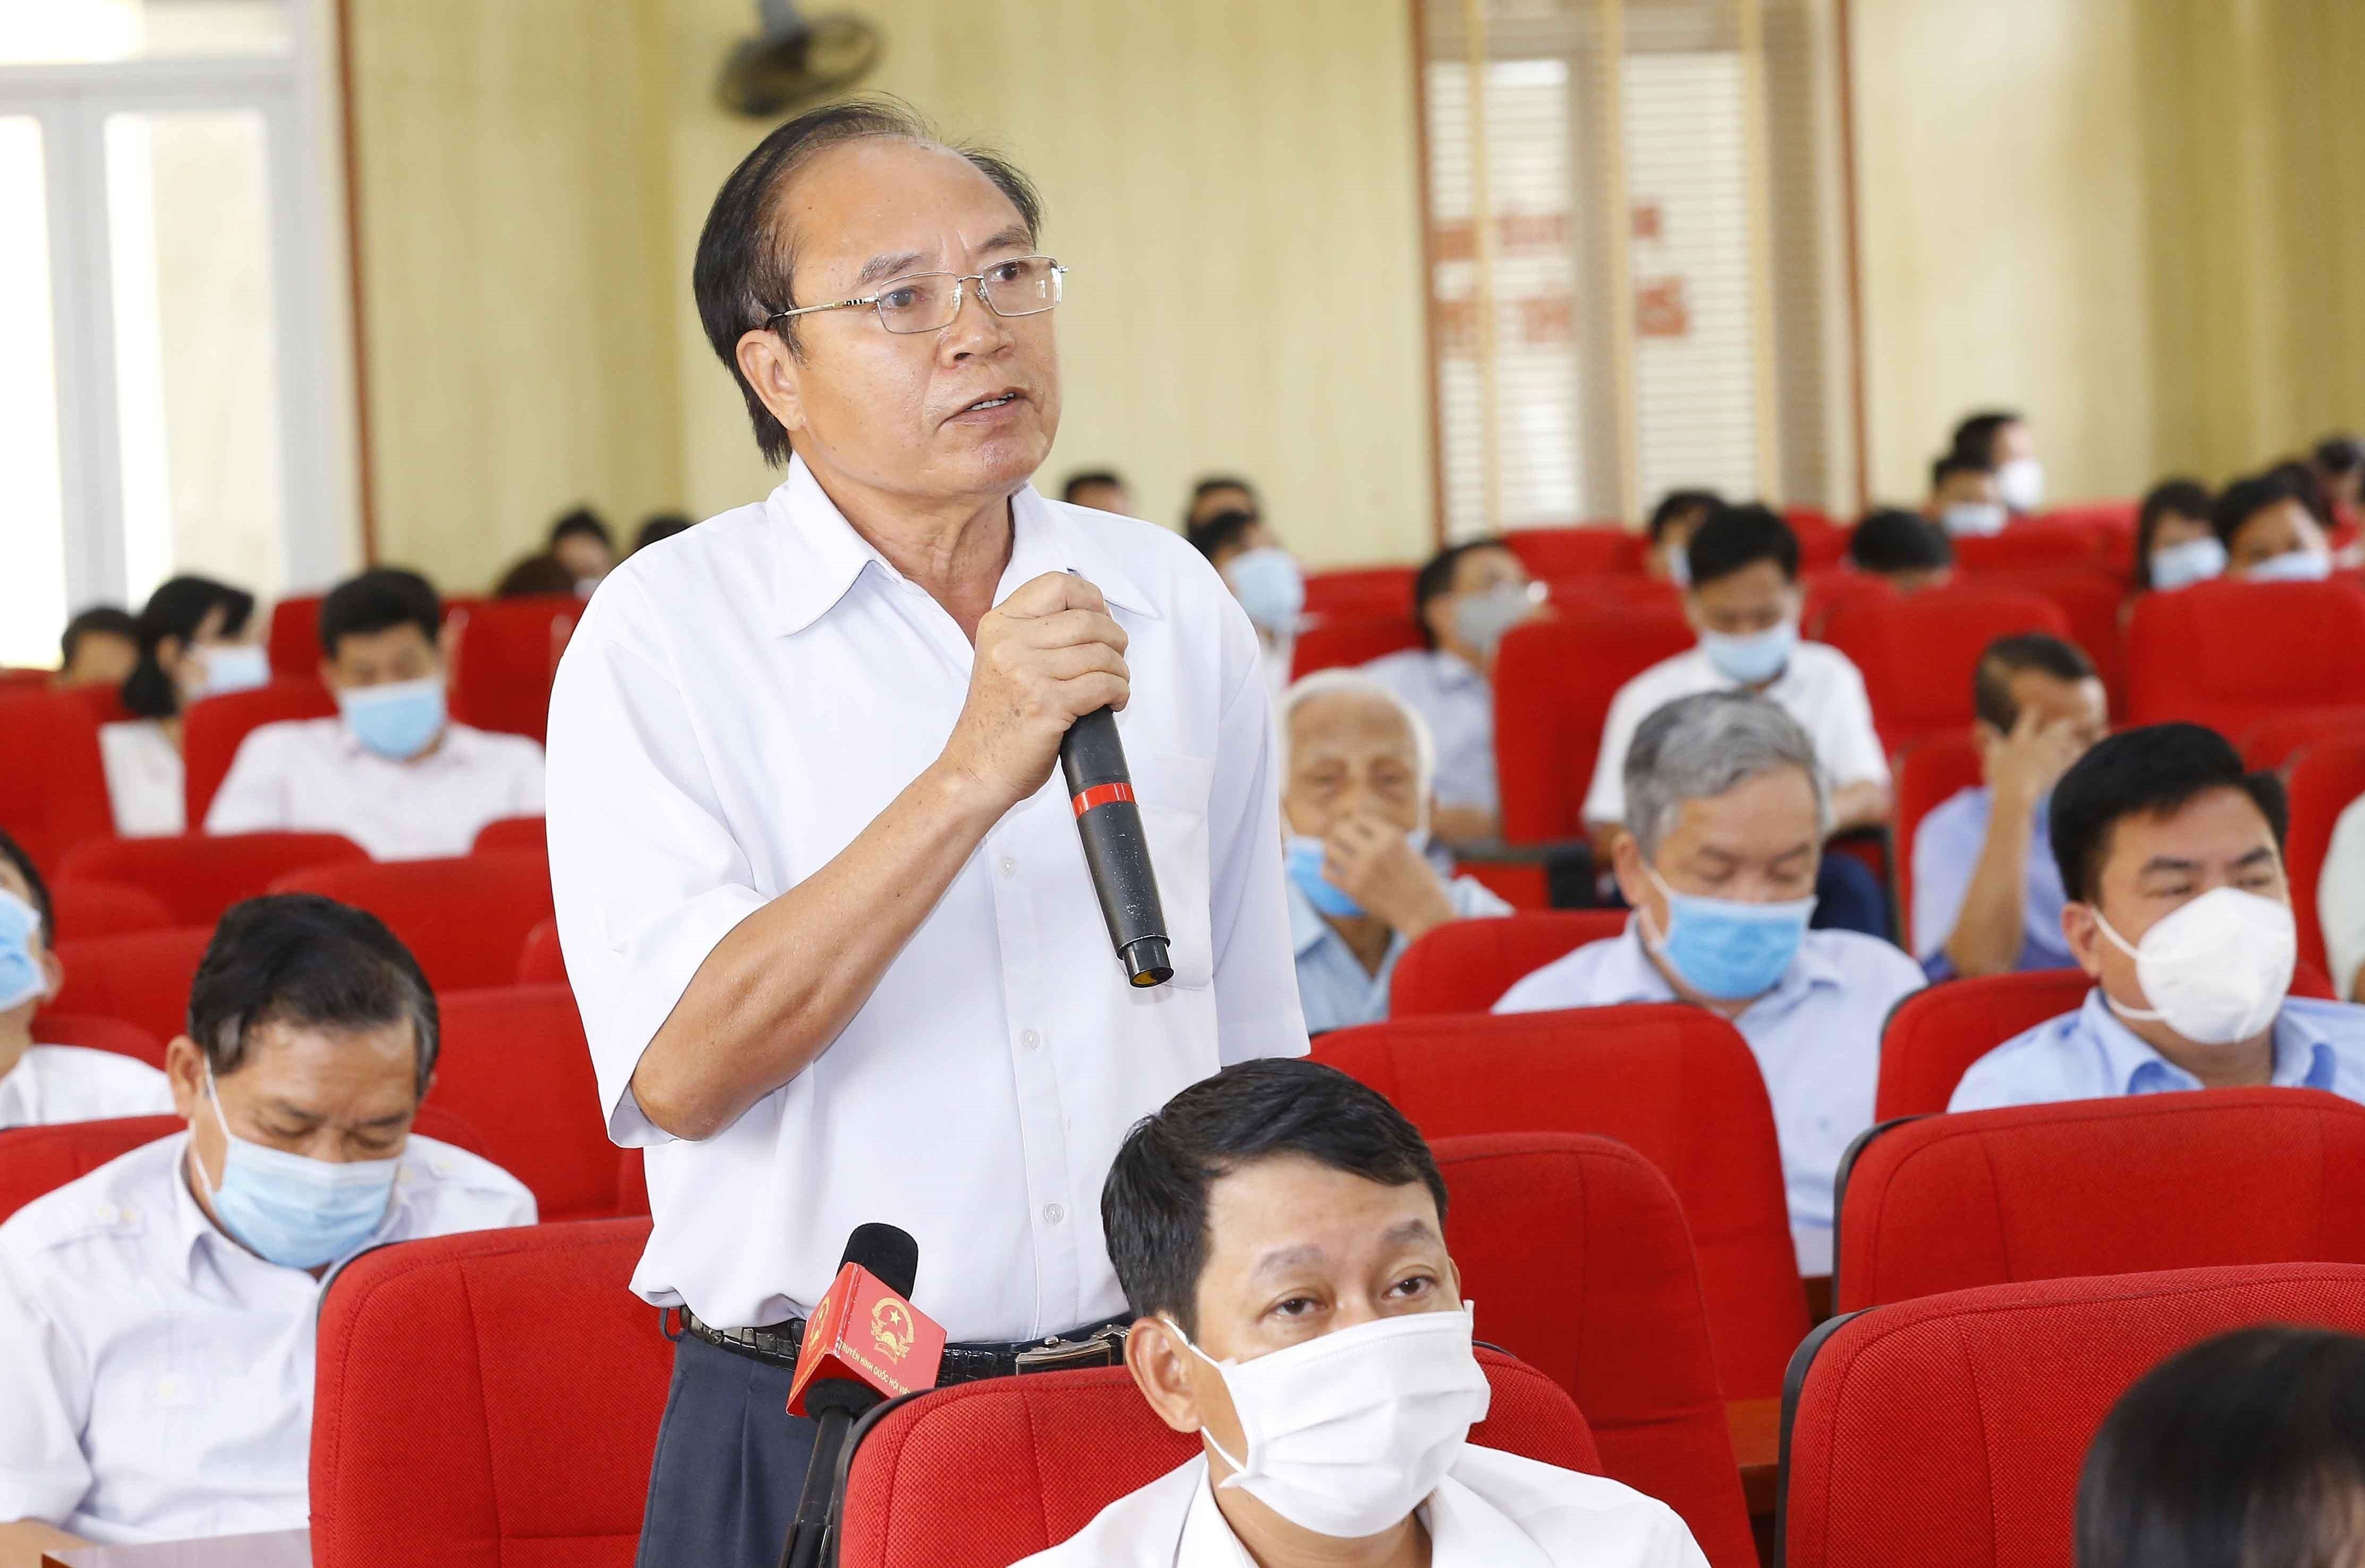 [Photo] Chu tich Quoc hoi Vuong Dinh Hue van dong bau cu tai Hai Phong hinh anh 5